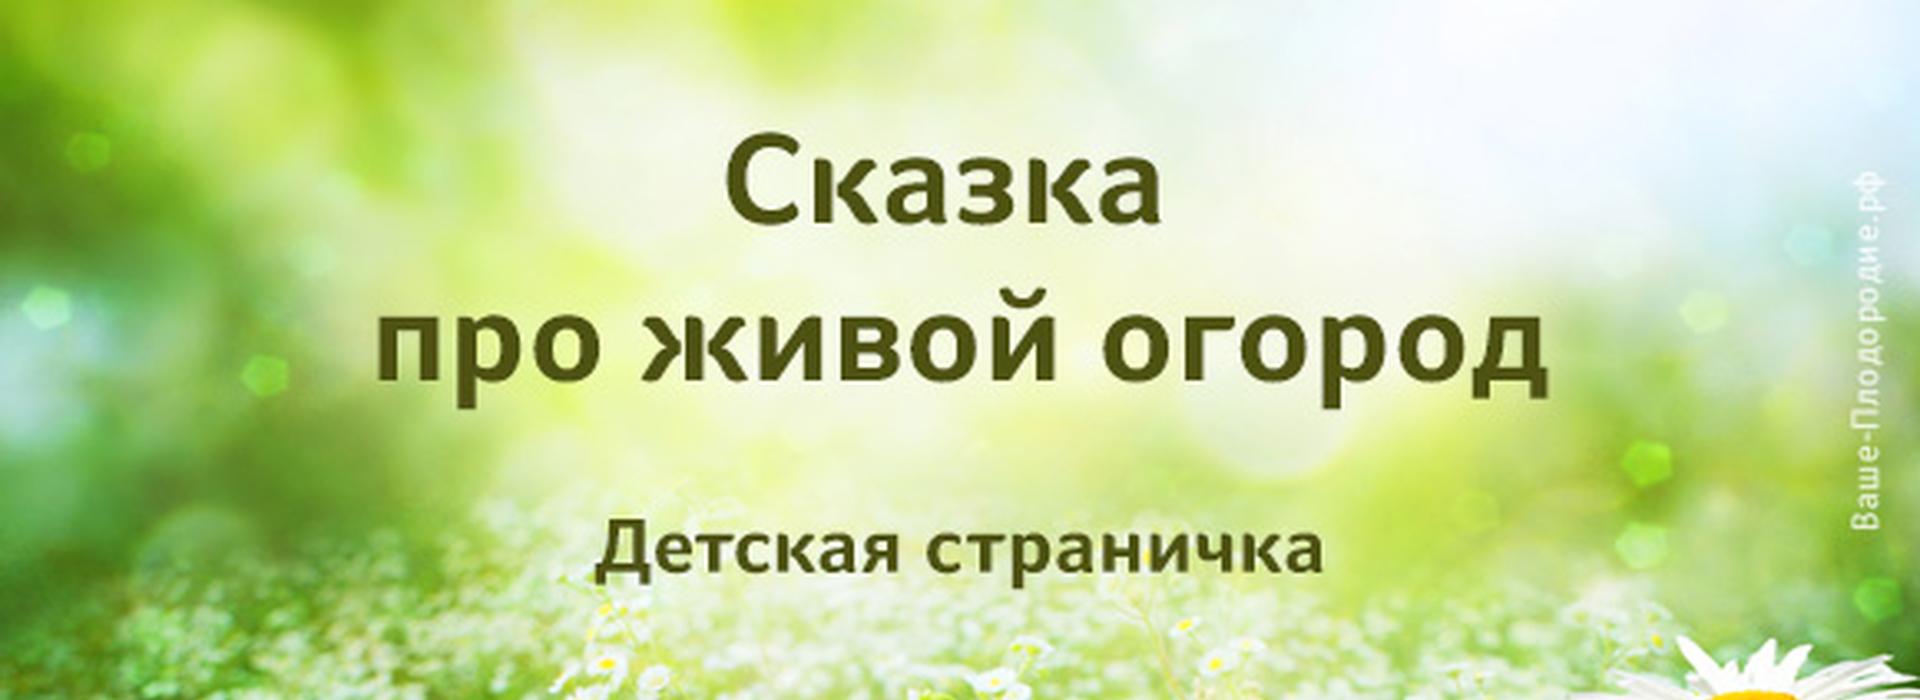 main_image_blog